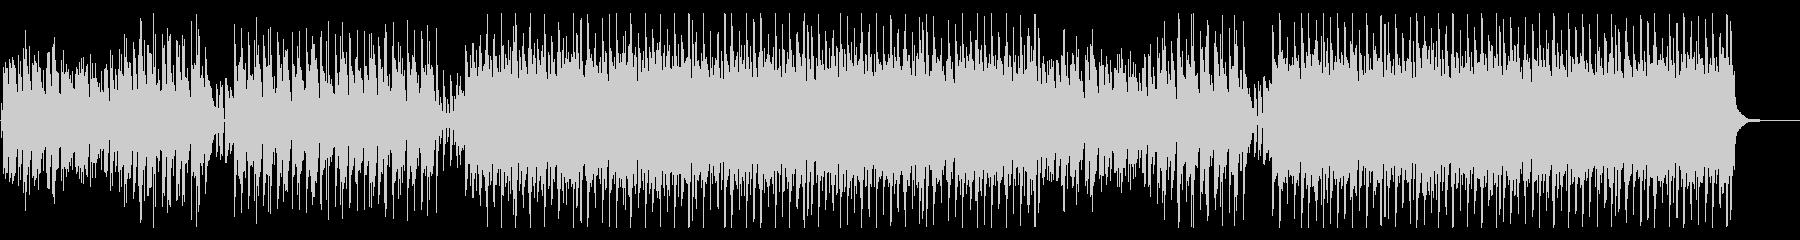 CMやVPにおしゃれかわいいピアノポップの未再生の波形